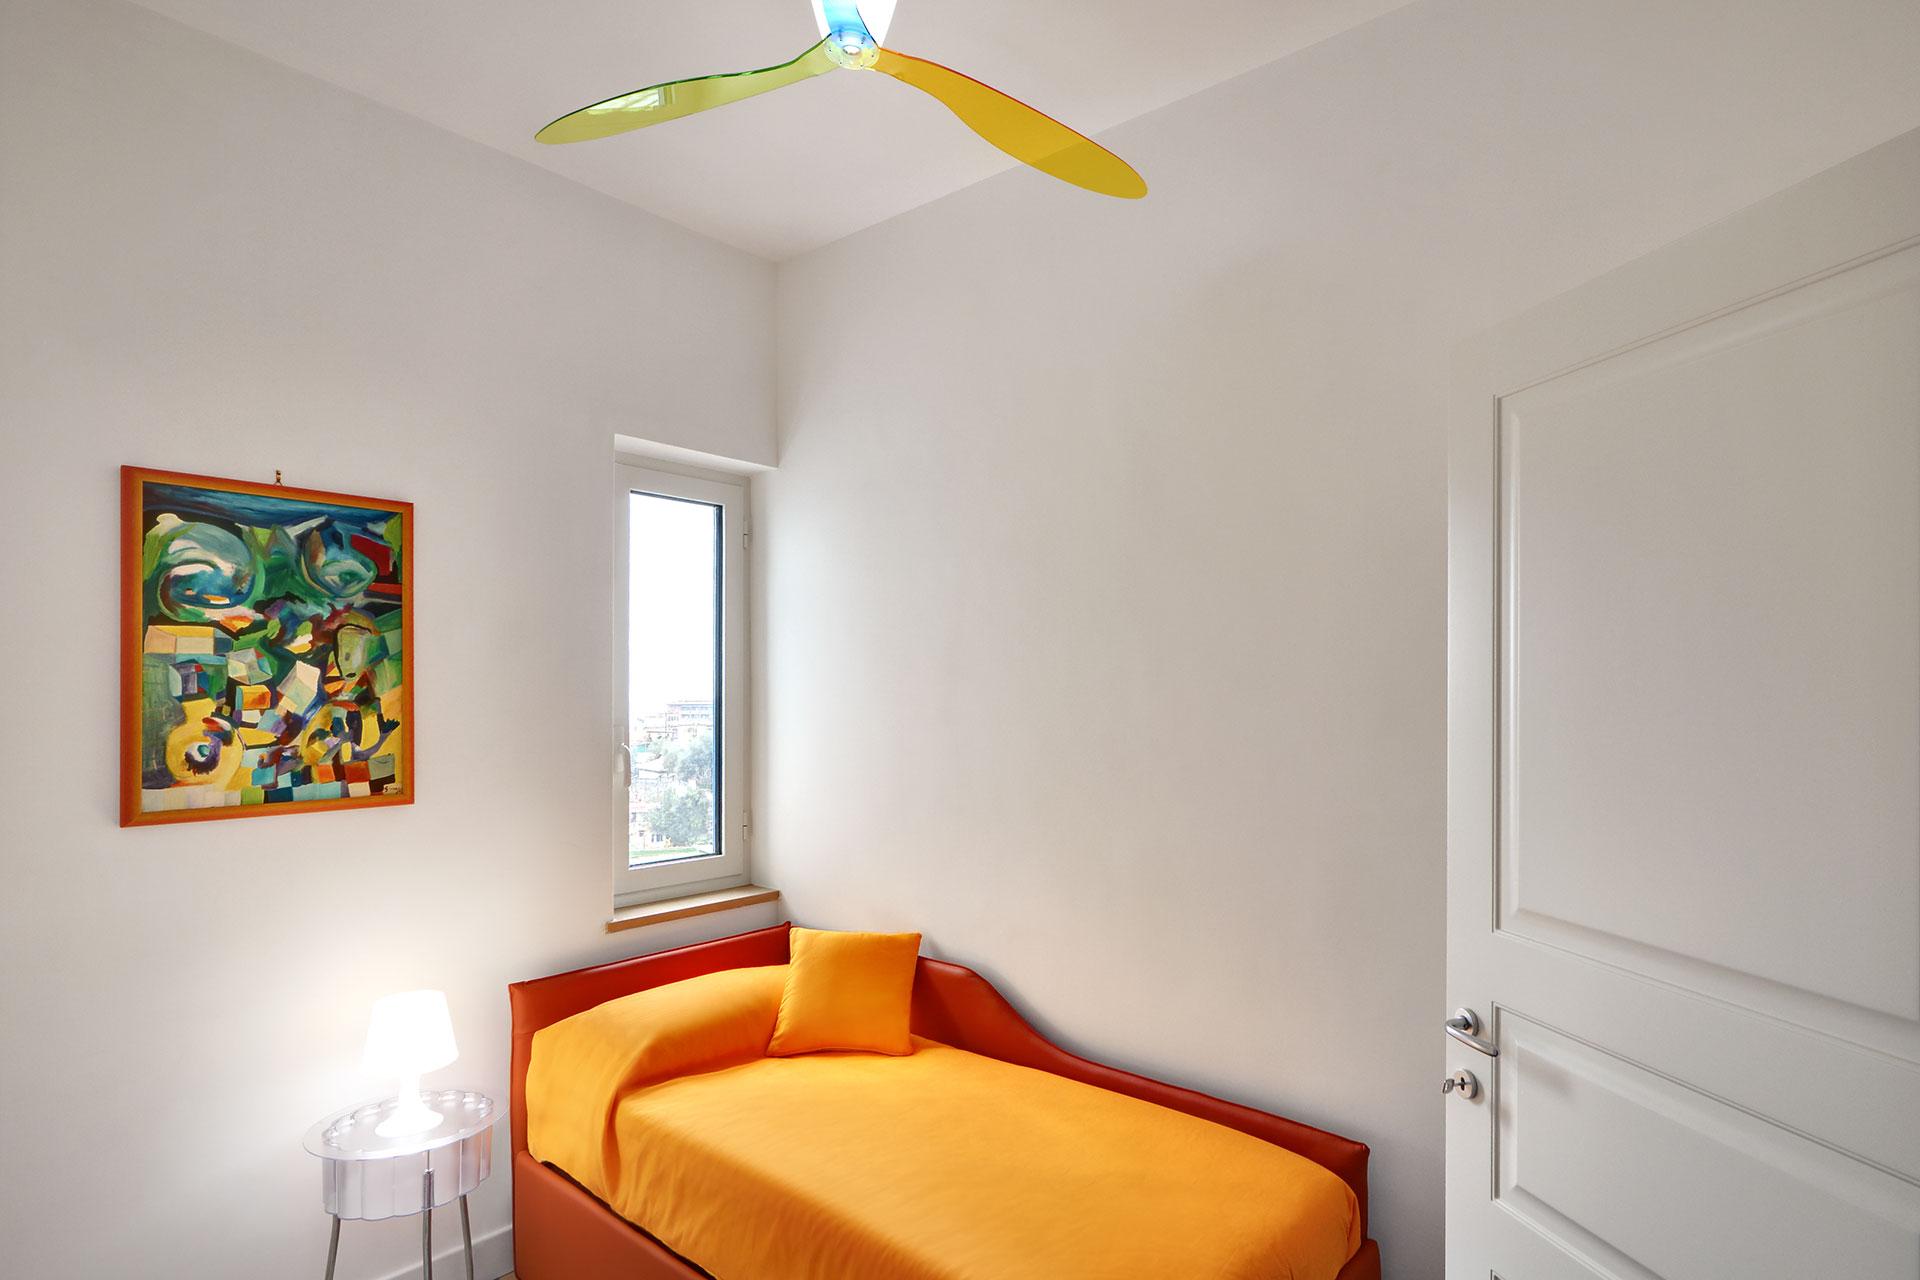 Apartment Sorrento Urban Beta   Explore the delights of Sorrento photo 20144862